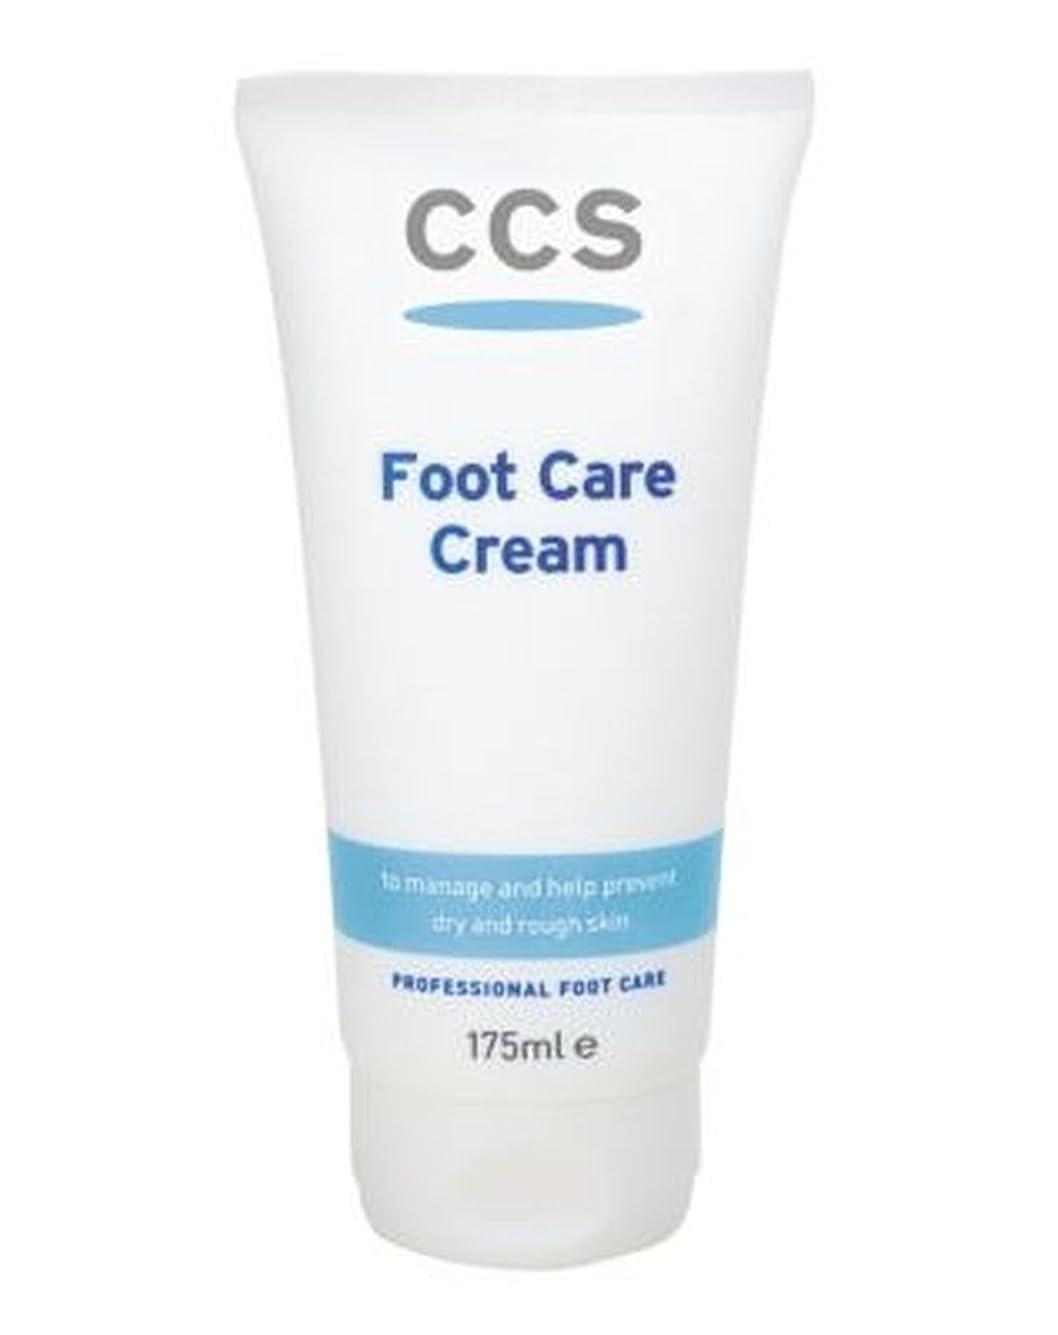 Ccs足のケアクリーム - 175ミリリットル (Ccs) (x2) - CCS Foot Care Cream - 175ml (Pack of 2) [並行輸入品]